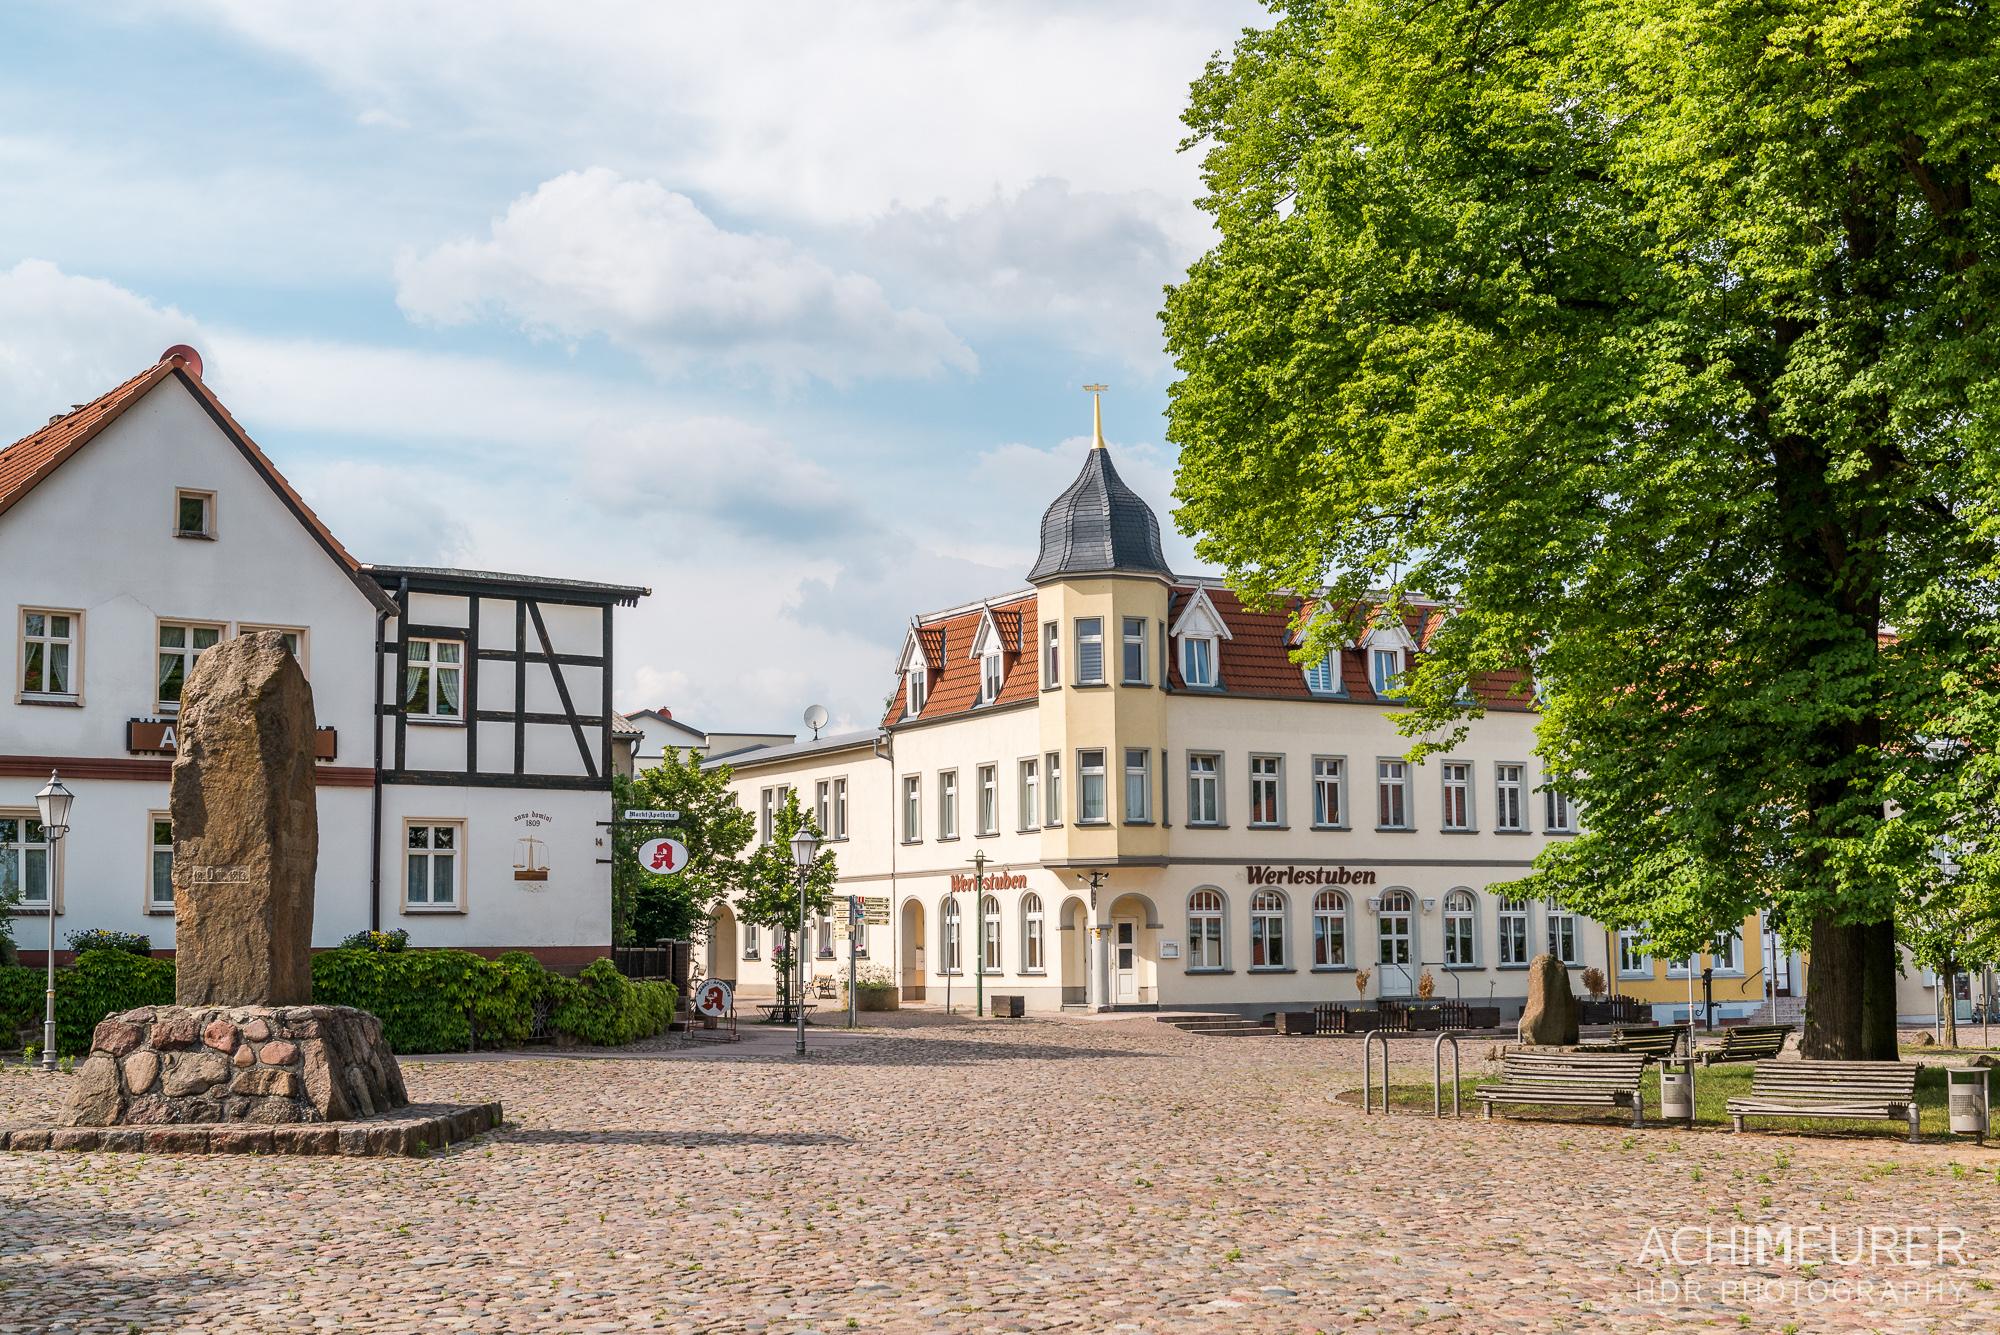 Hausboot-Kuhnle-Mueritz-Mecklenburg-Vorpommern-See_2917